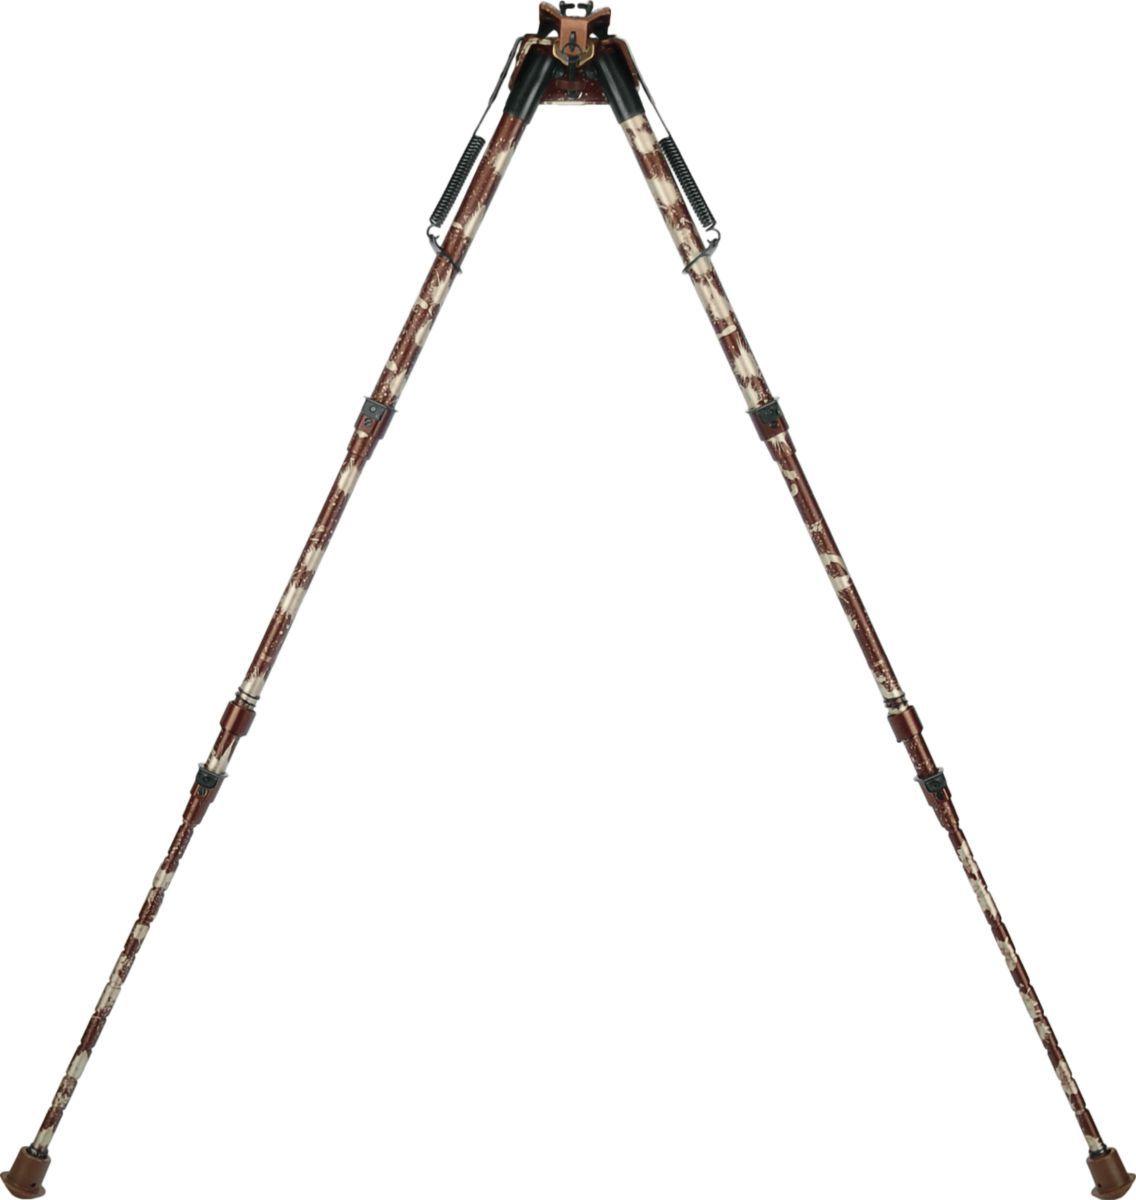 Caldwell® Camo XLA Bipods™